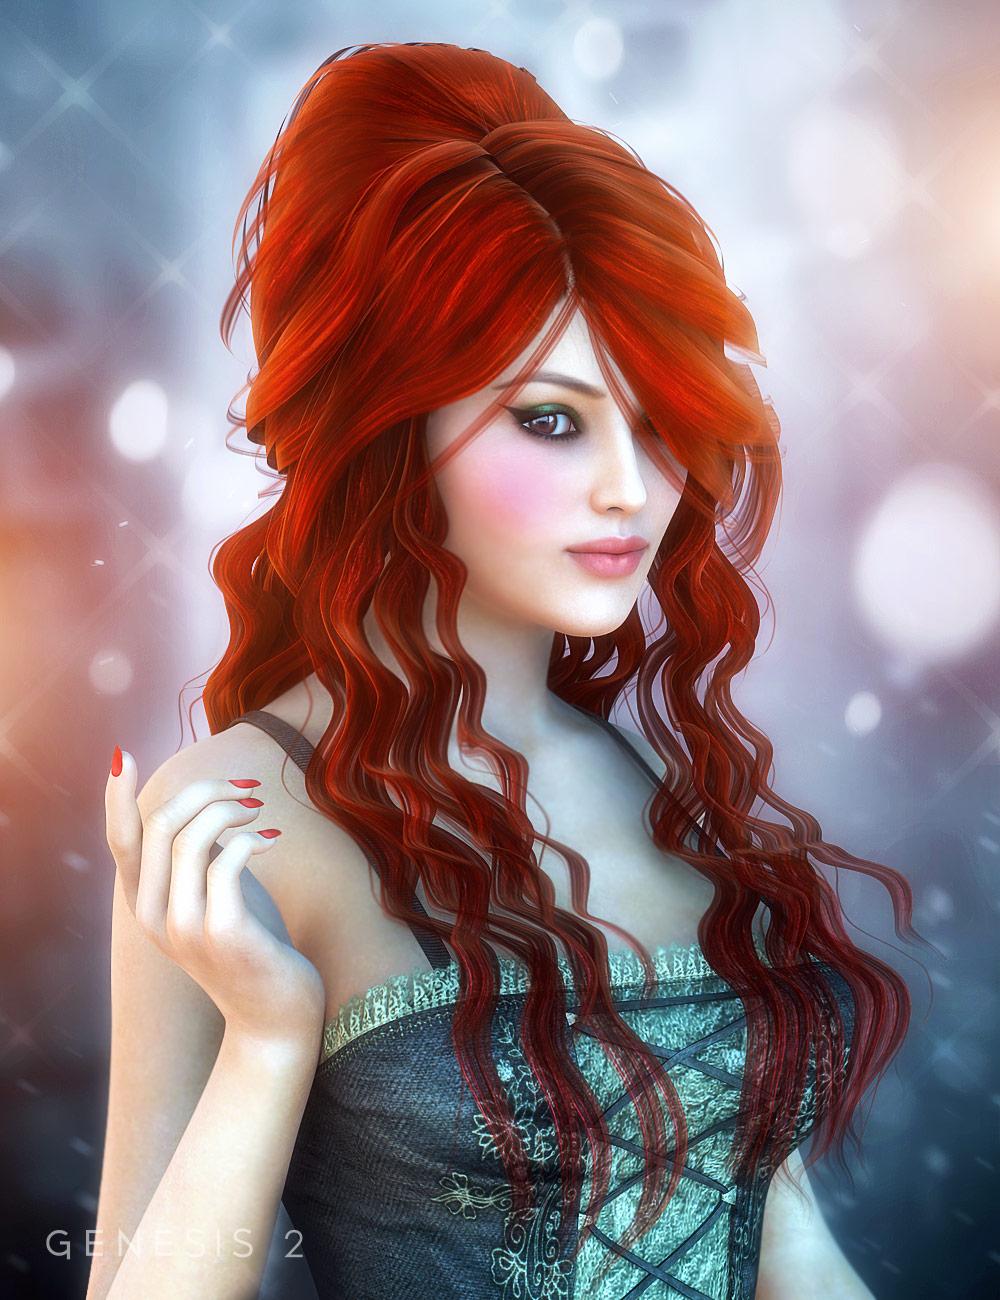 Allessa Hair by: , 3D Models by Daz 3D